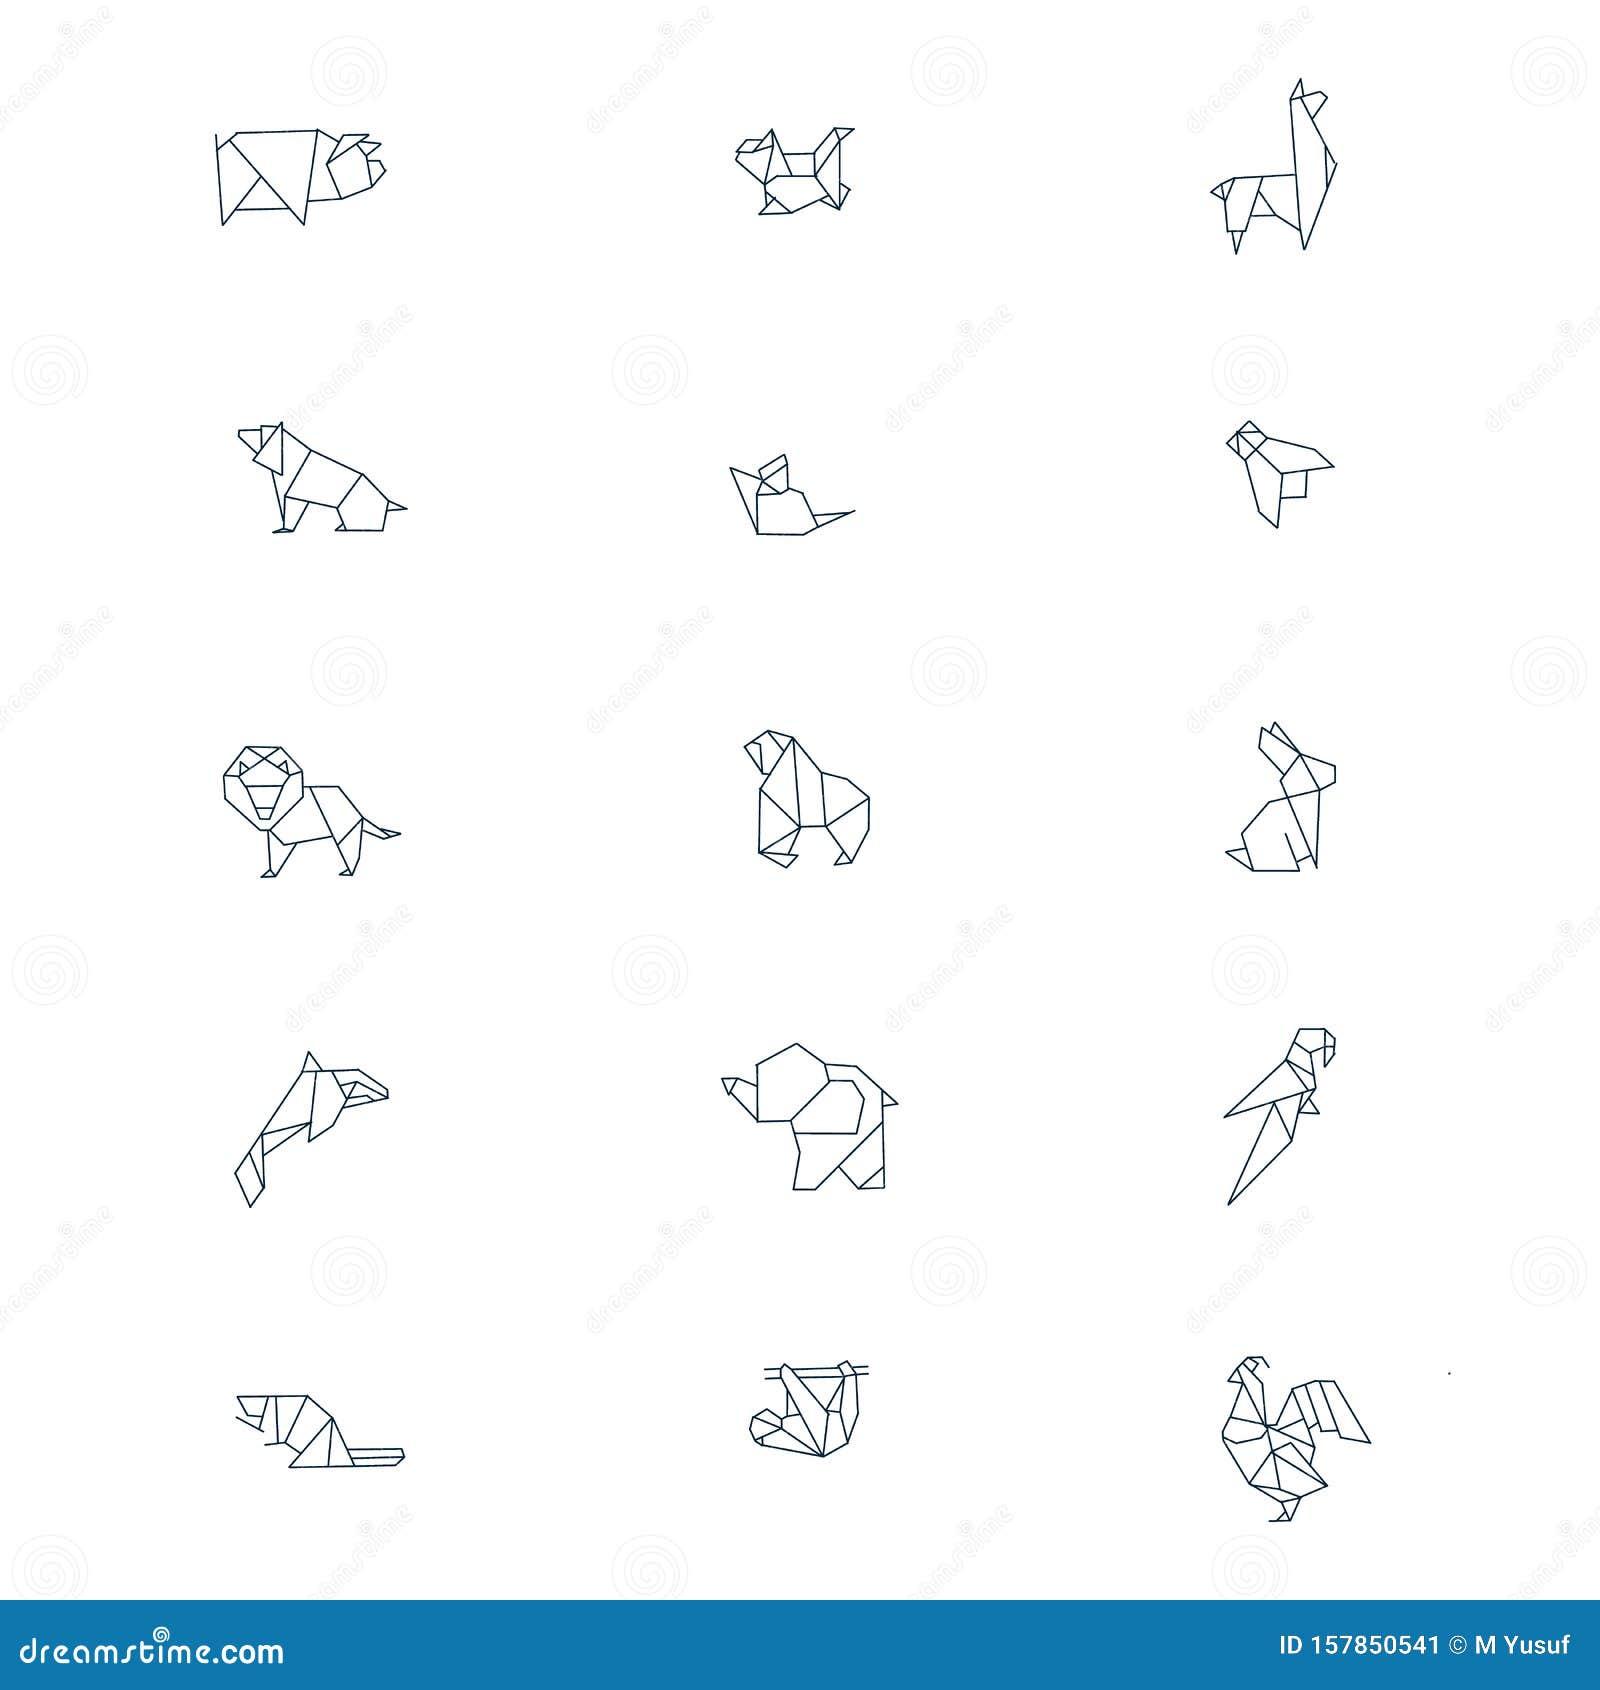 Origami Kangaroo Tutorial - YouTube | 1689x1600